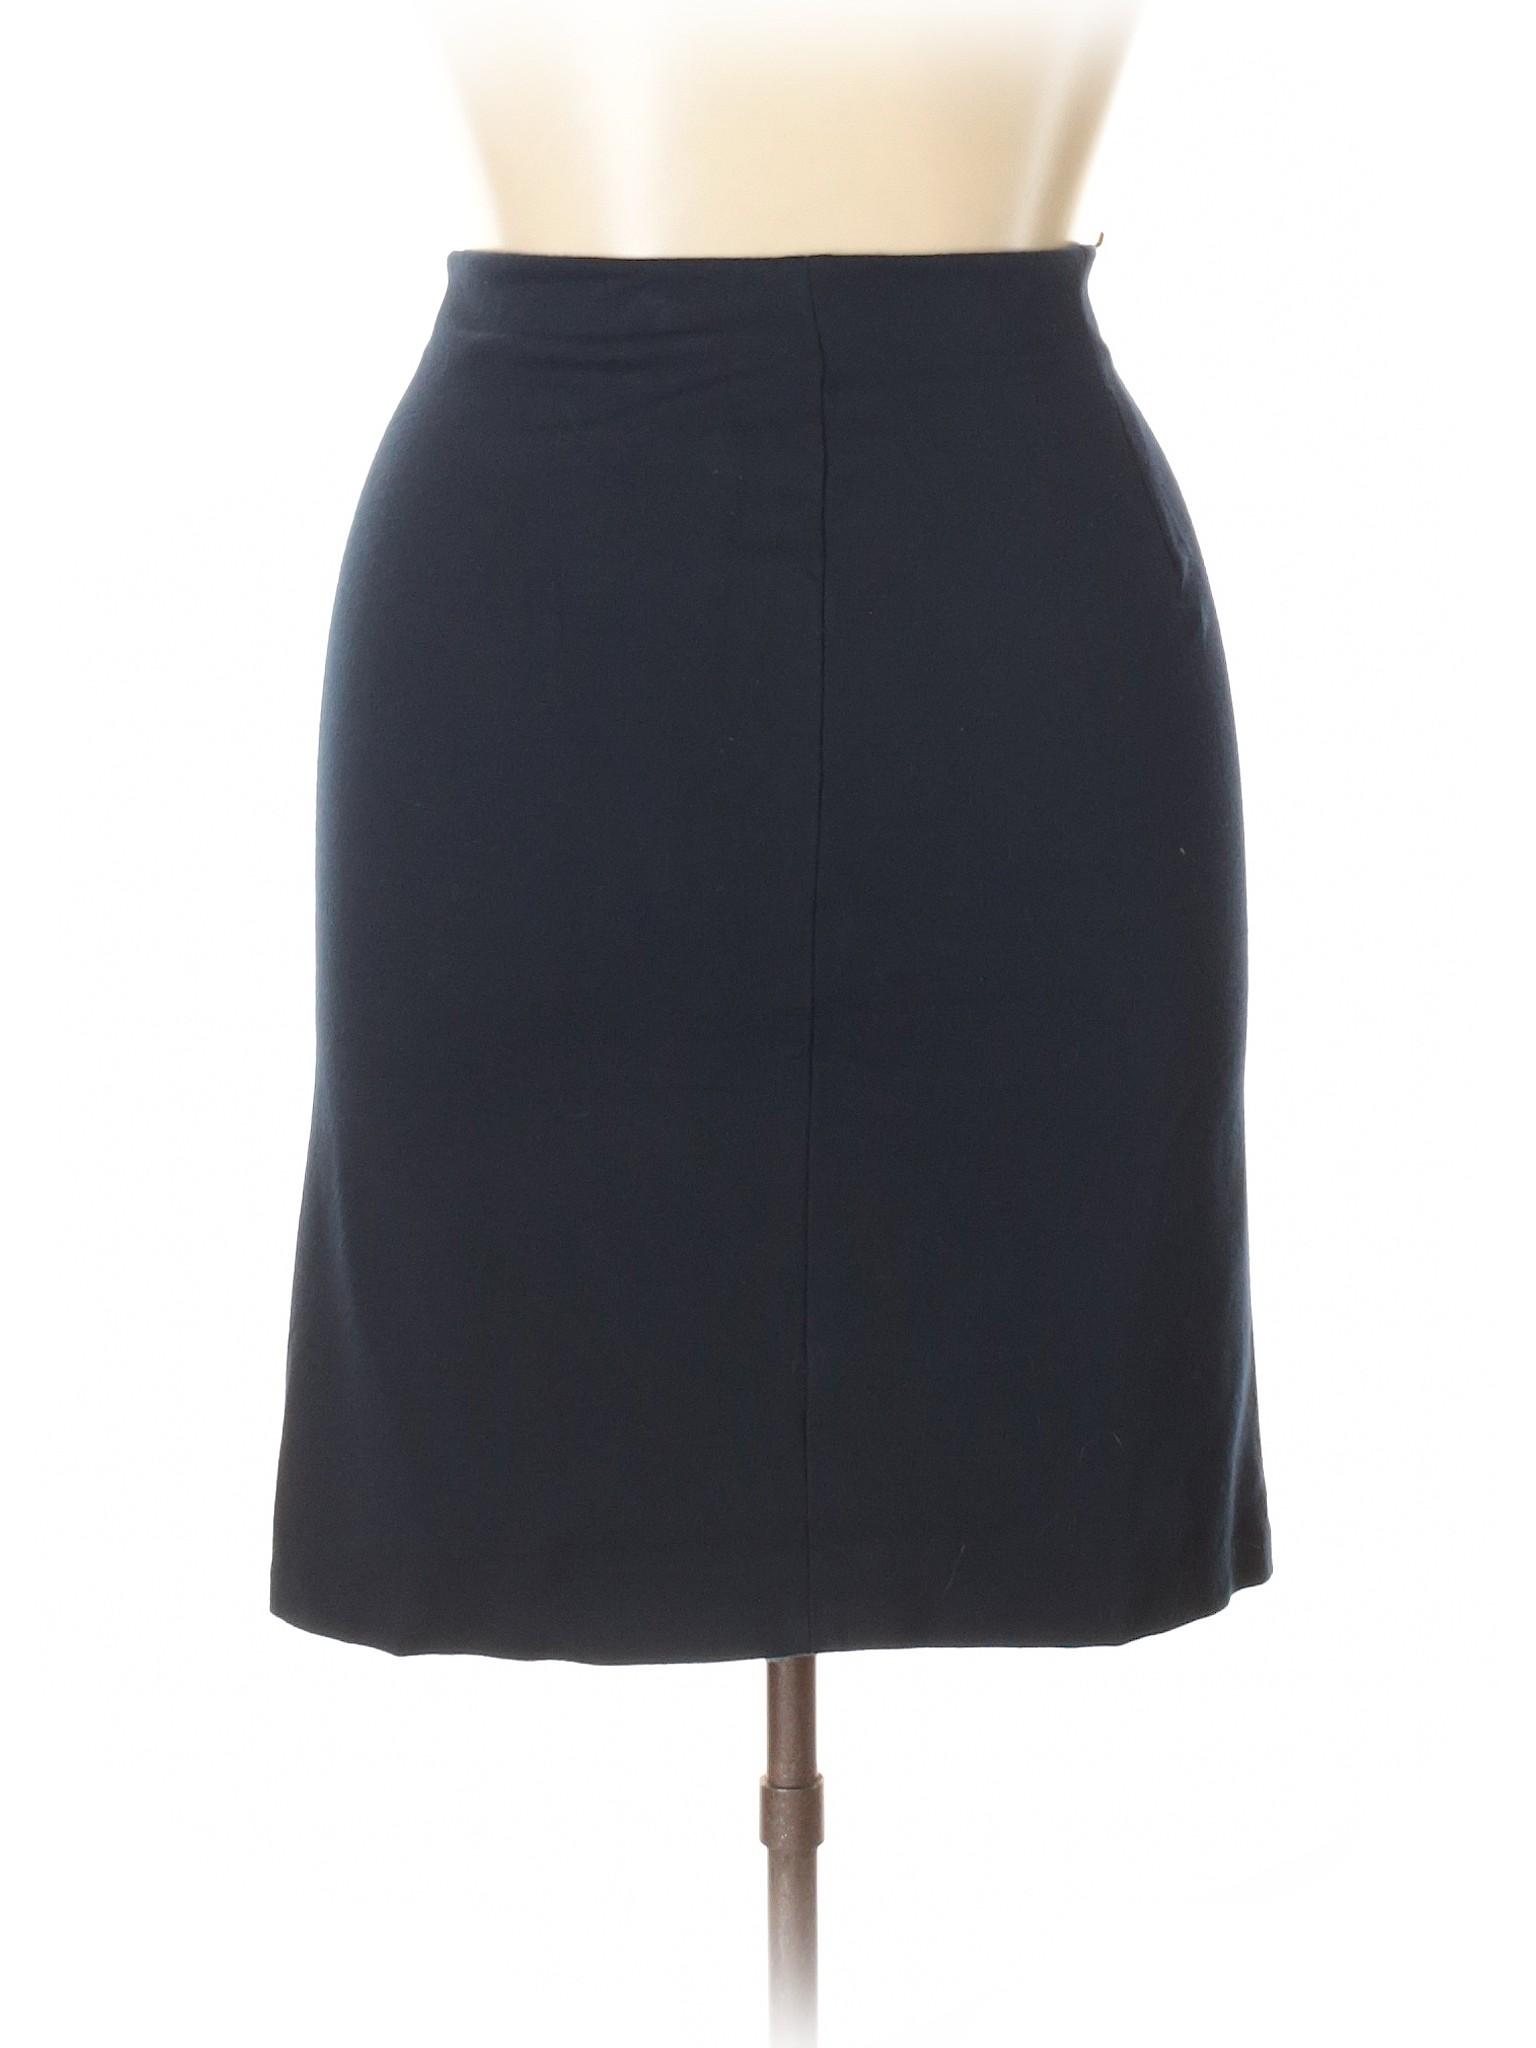 winter Clothing Leisure Skirt Casual Republic Philosophy d7TqwApF